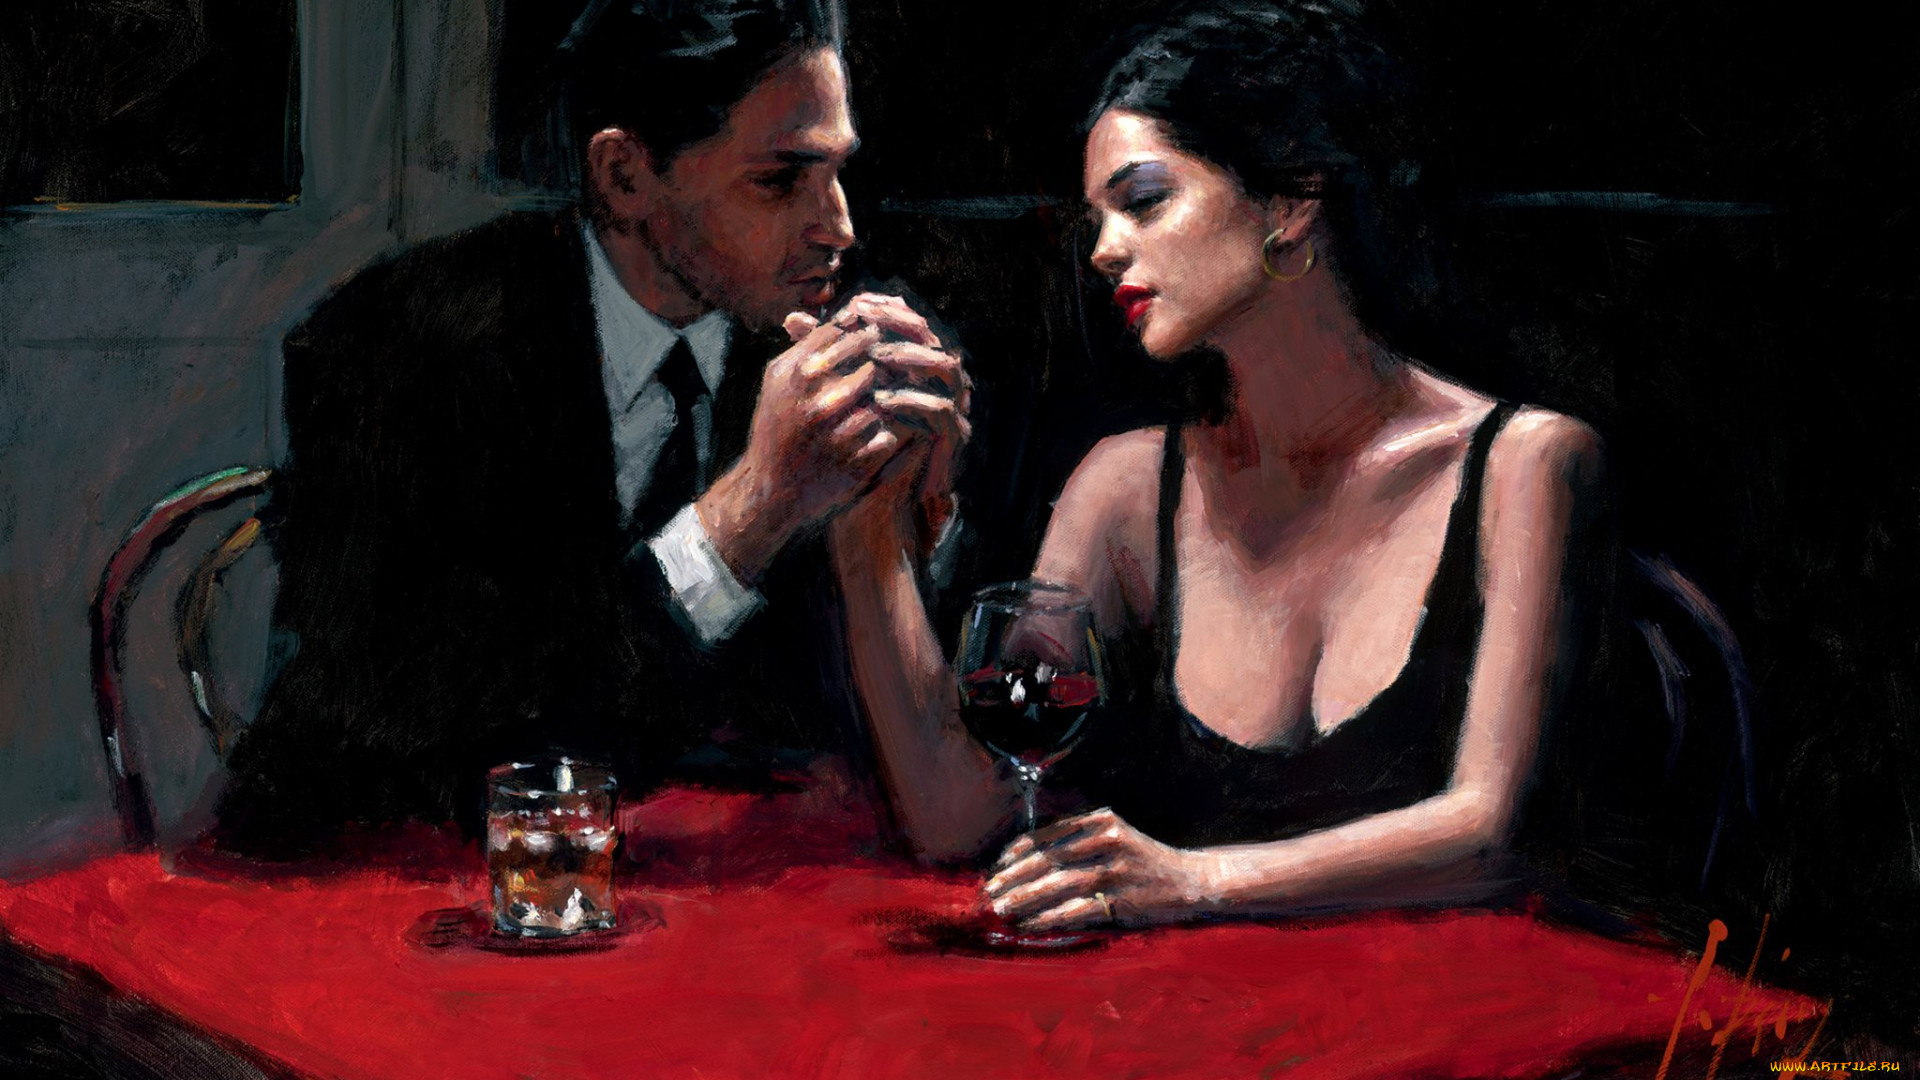 Artwork Painting Women Men Couple Love Sitting Wine 1920x1080